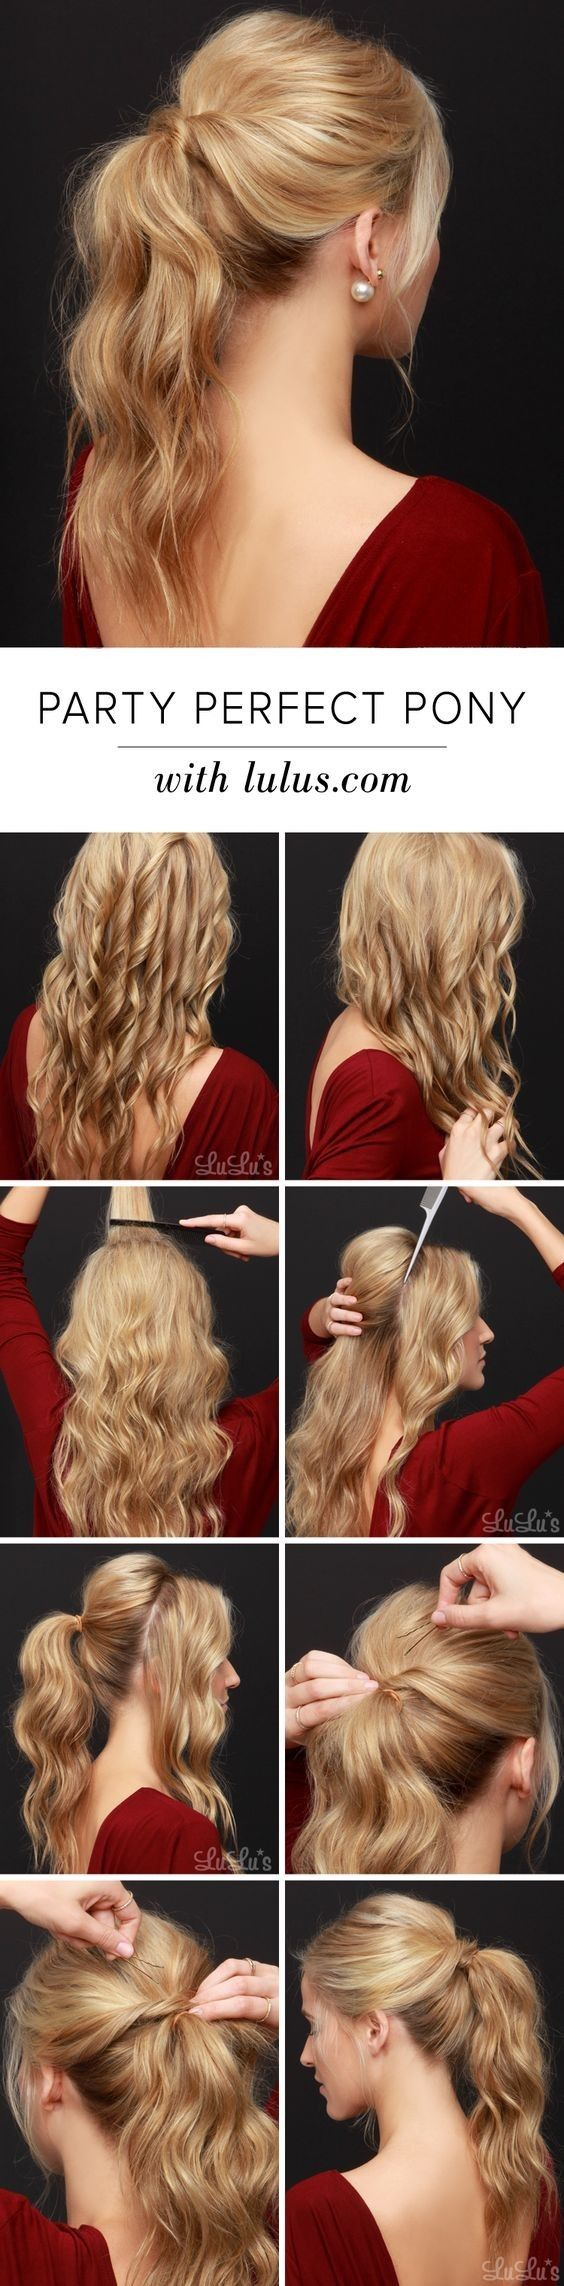 awesome 10 Easy queue of horse hair //  #Easy #Hair #horse #queue